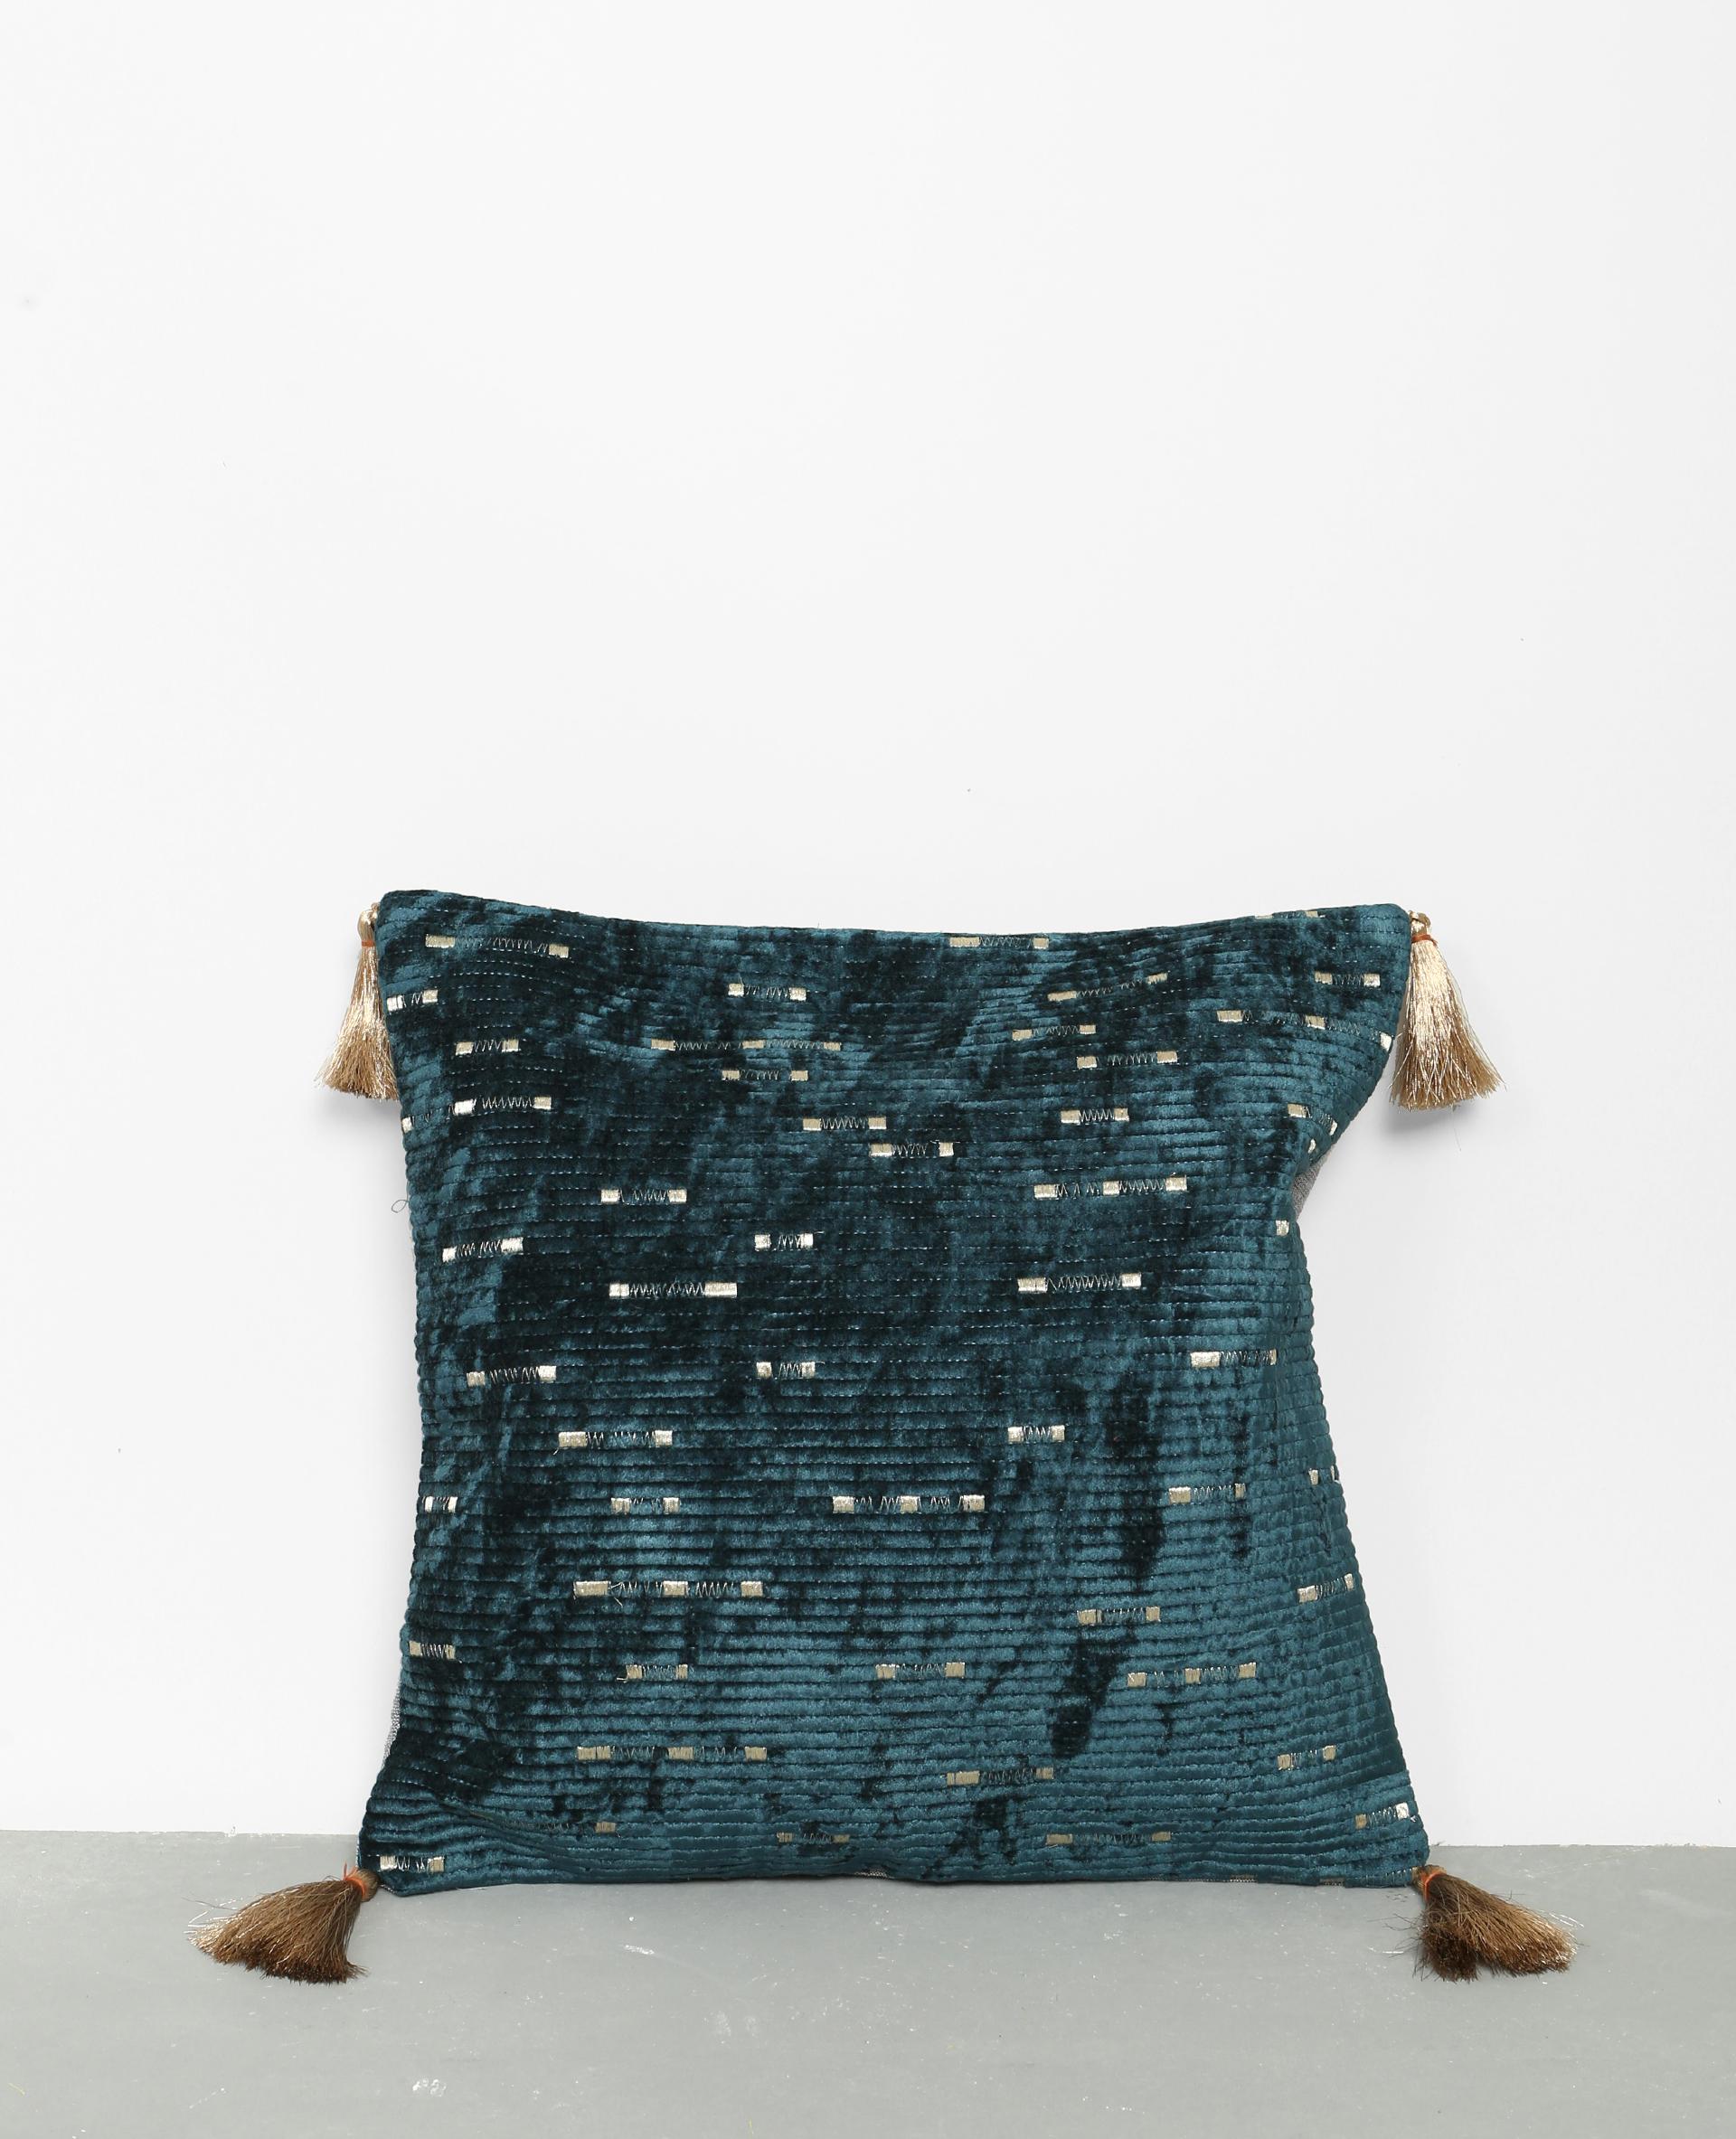 housse de coussin brod e bleu canard 907670b36a06 pimkie. Black Bedroom Furniture Sets. Home Design Ideas